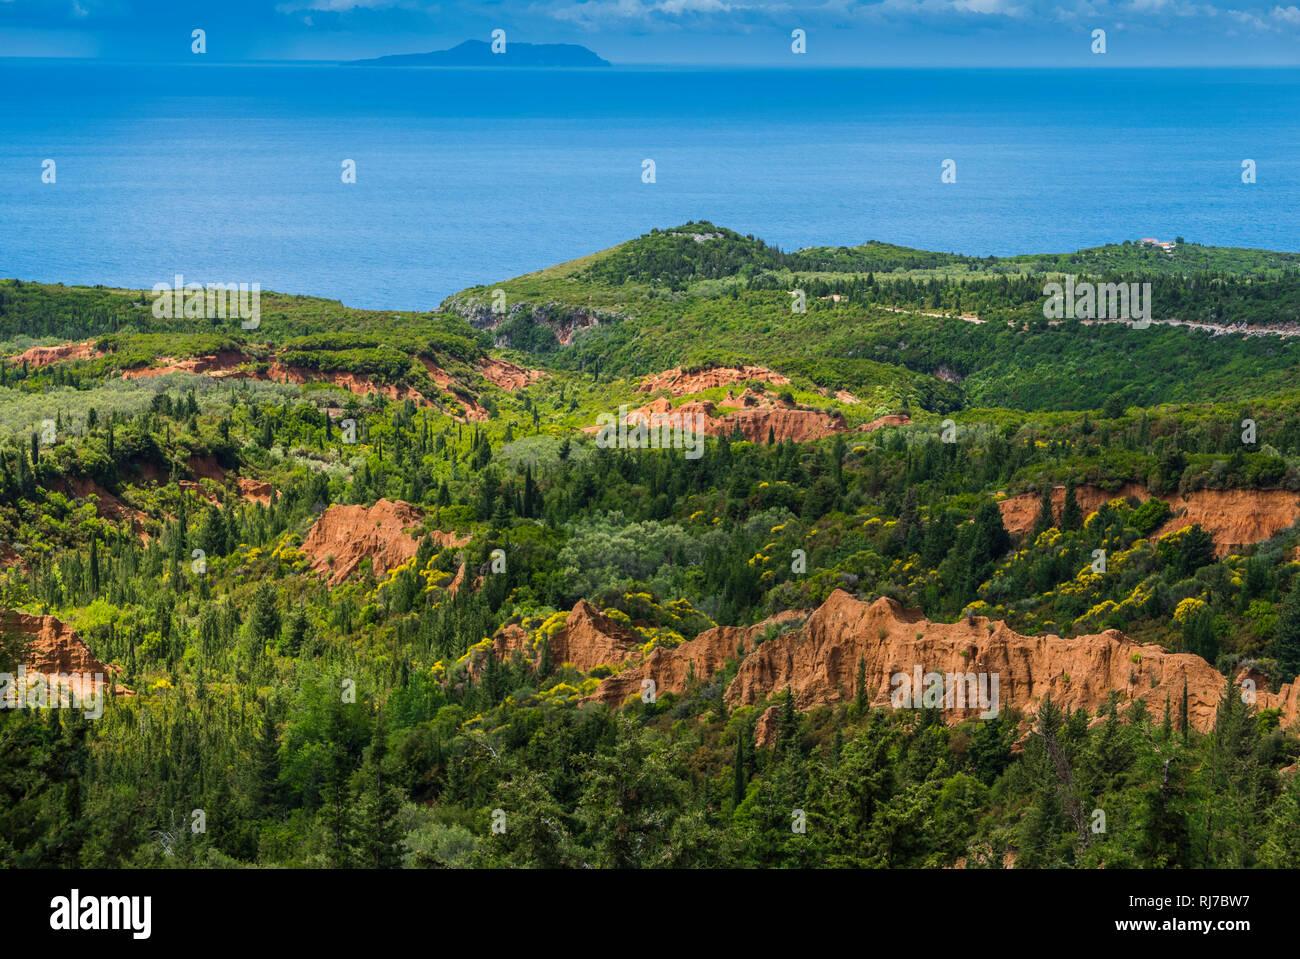 Albanien, Balkanhalbinsel, Südosteuropa, Republik Albanien, Gjipe Schlucht bei Vlore - Stock Image